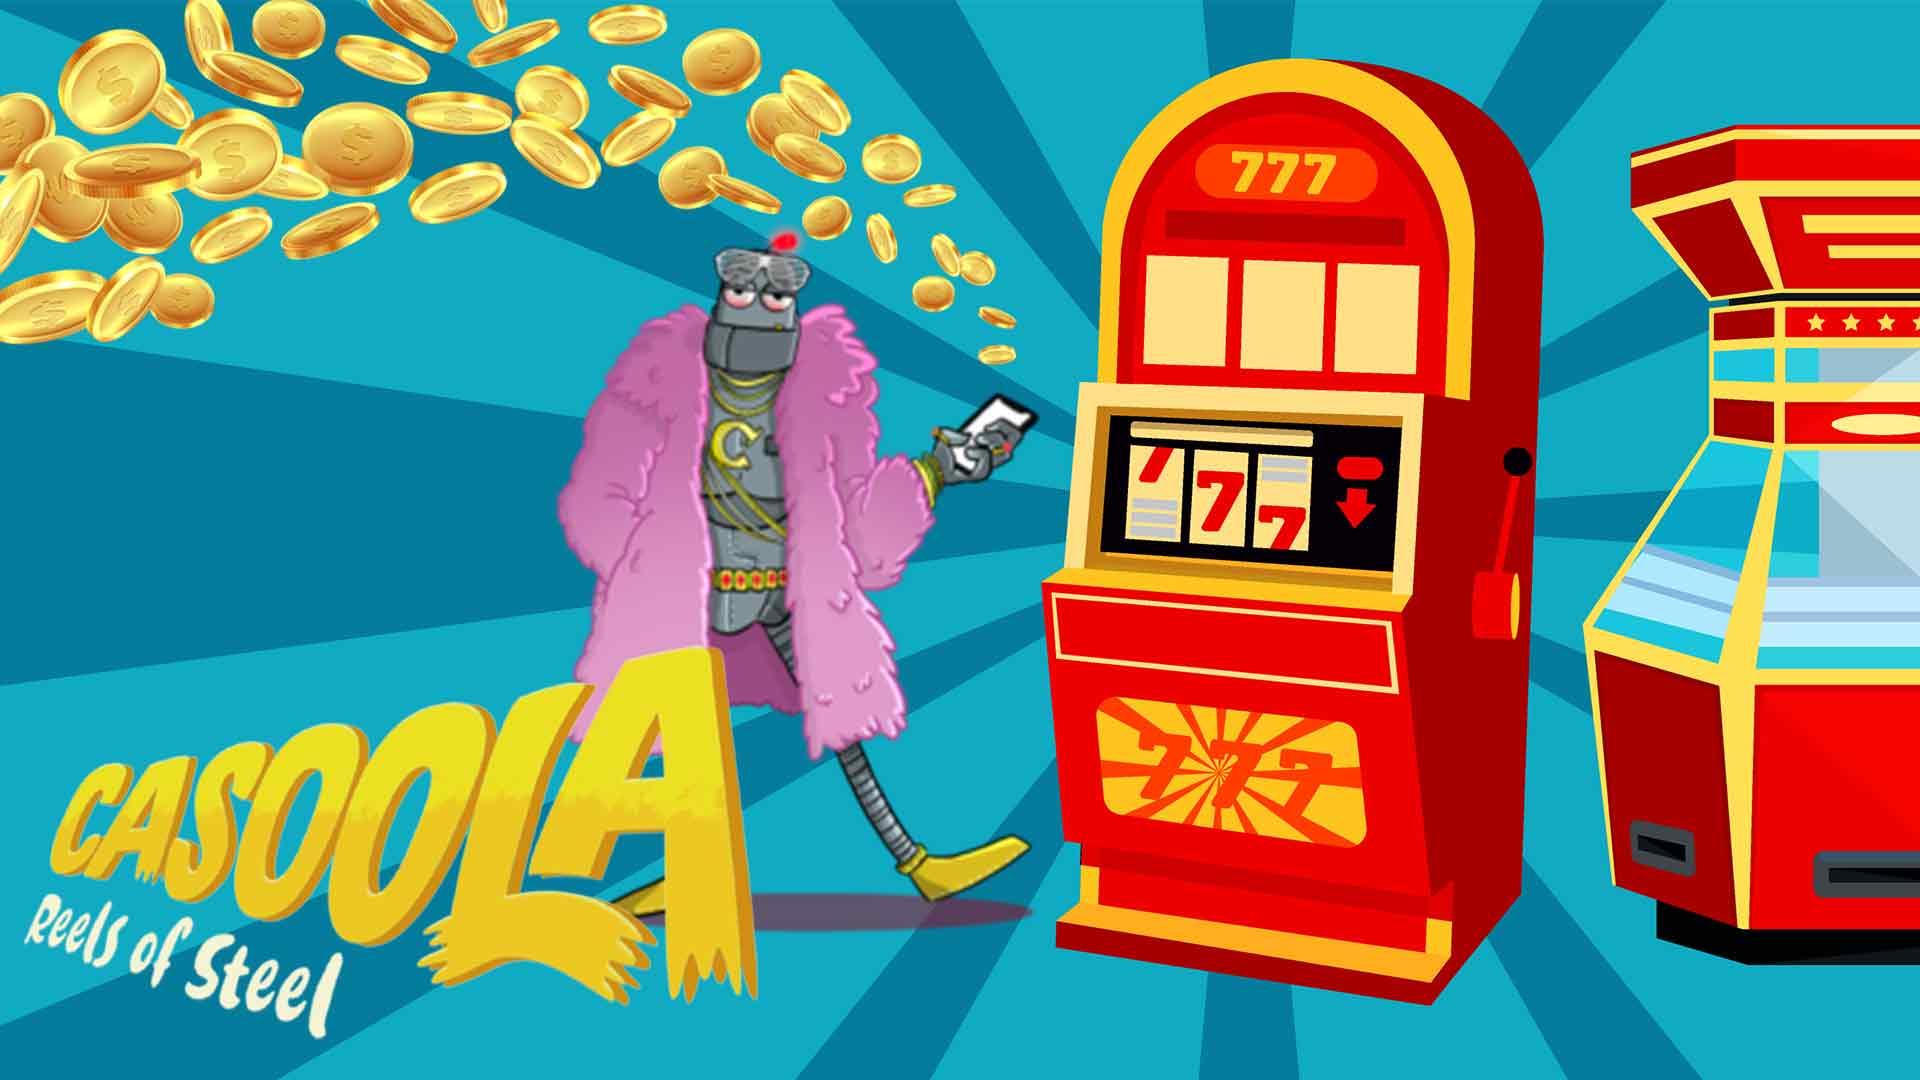 casoola responsible gambling